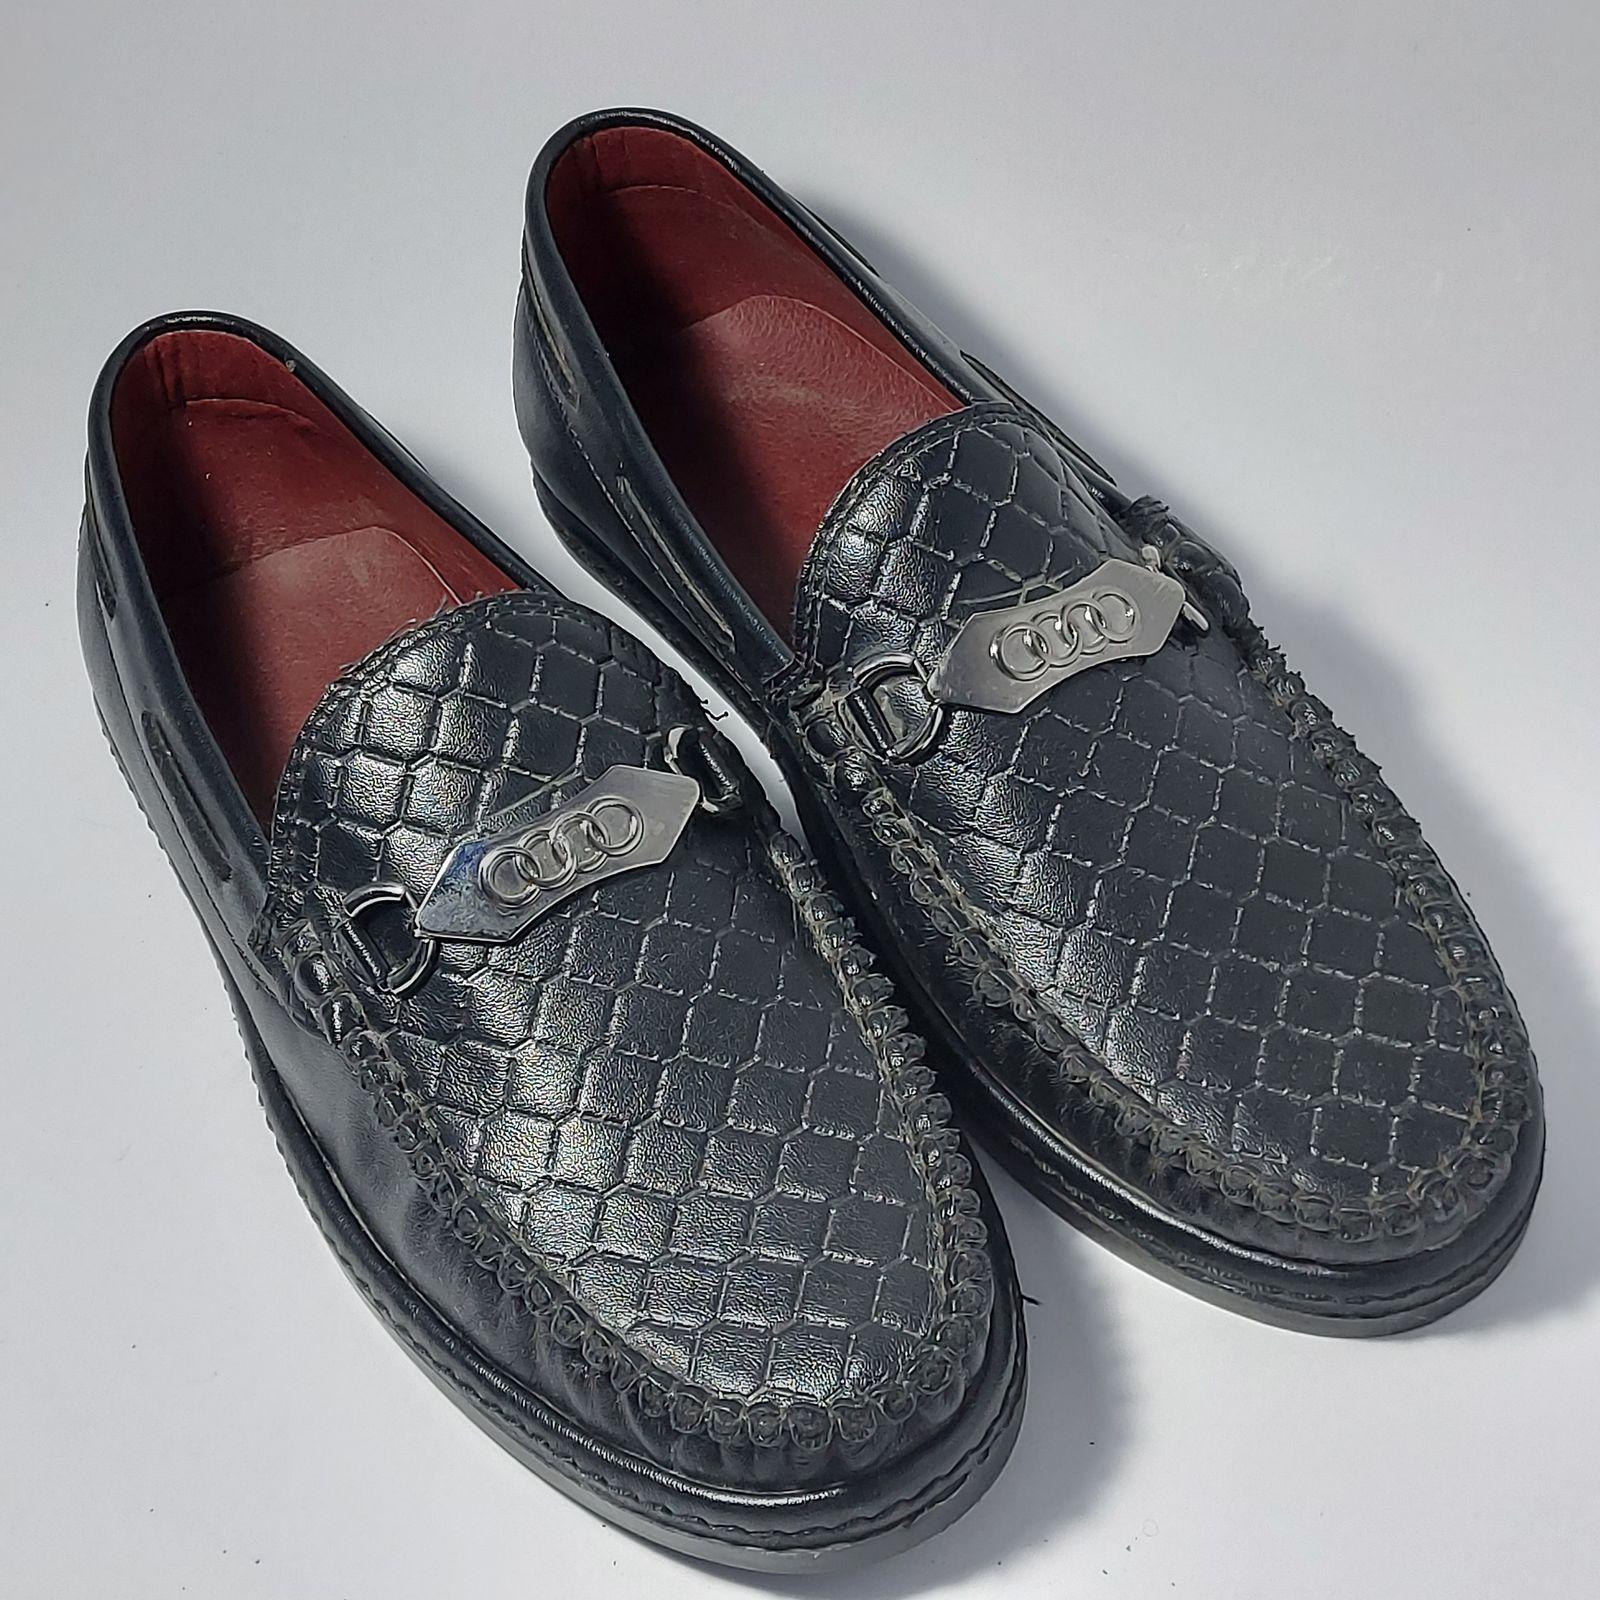 کفش روزمره مردانه مدل CH008 -  - 3